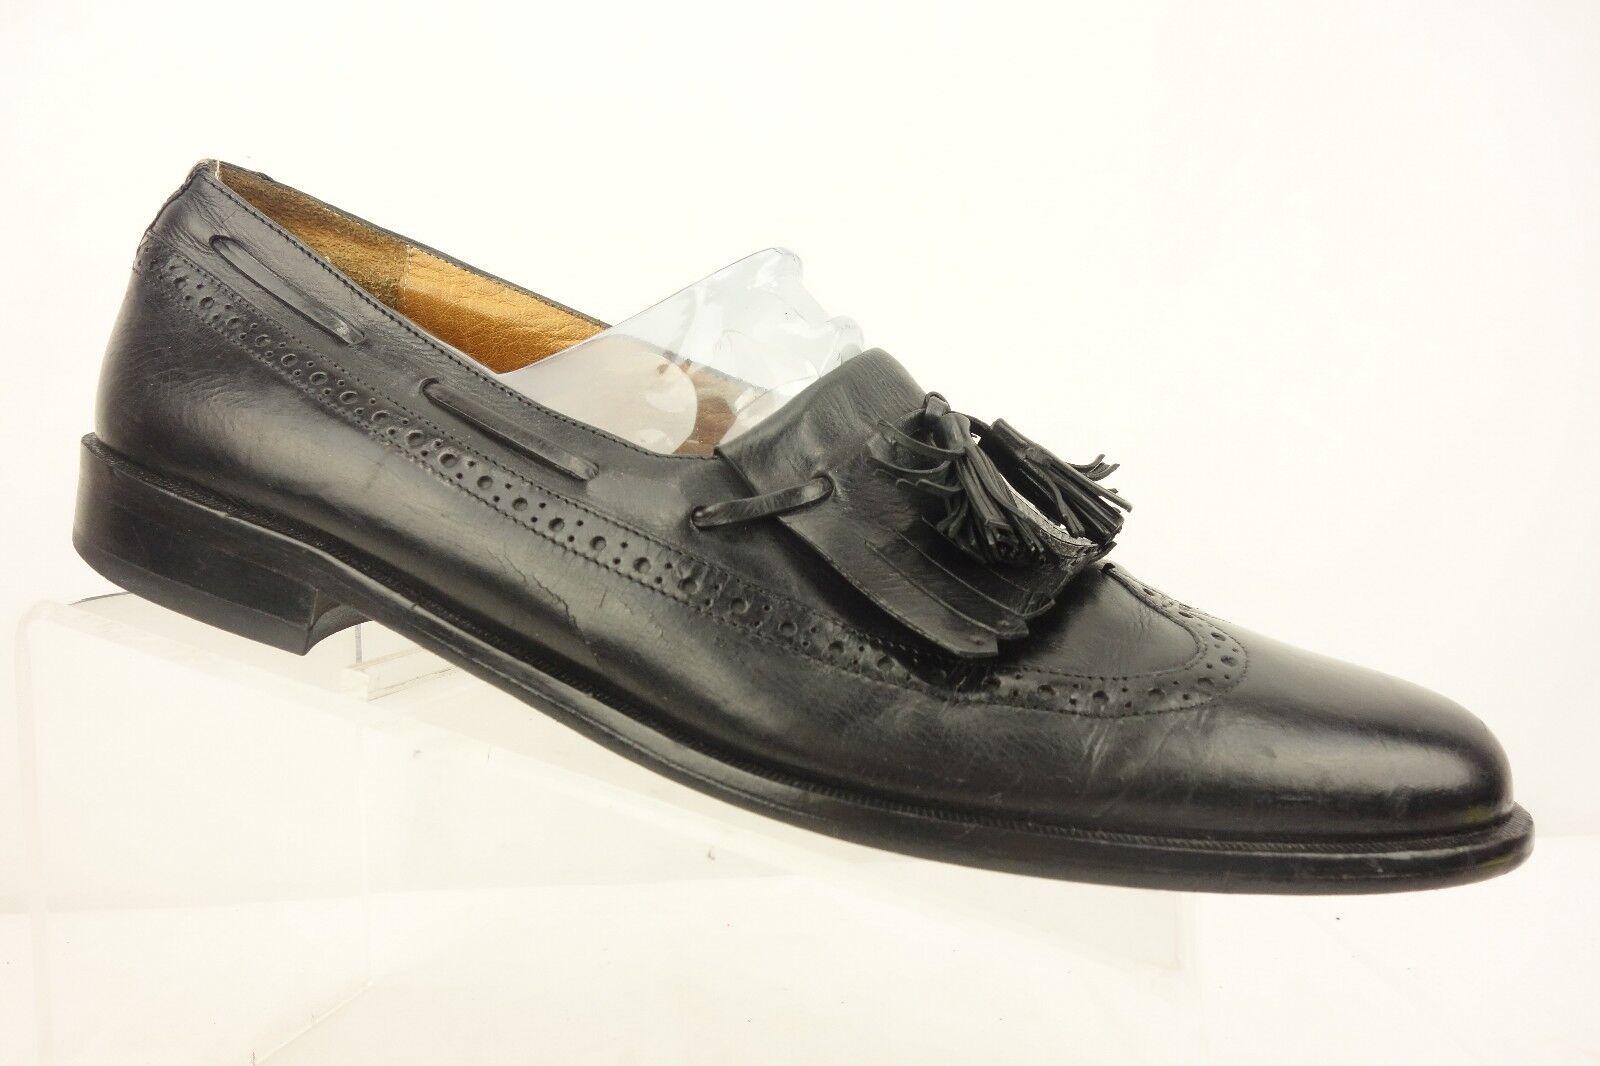 JOHNSTON & MURPHY Black Leather Slip On Loafer shoes Double Tassel Mens SZ 11.5 N